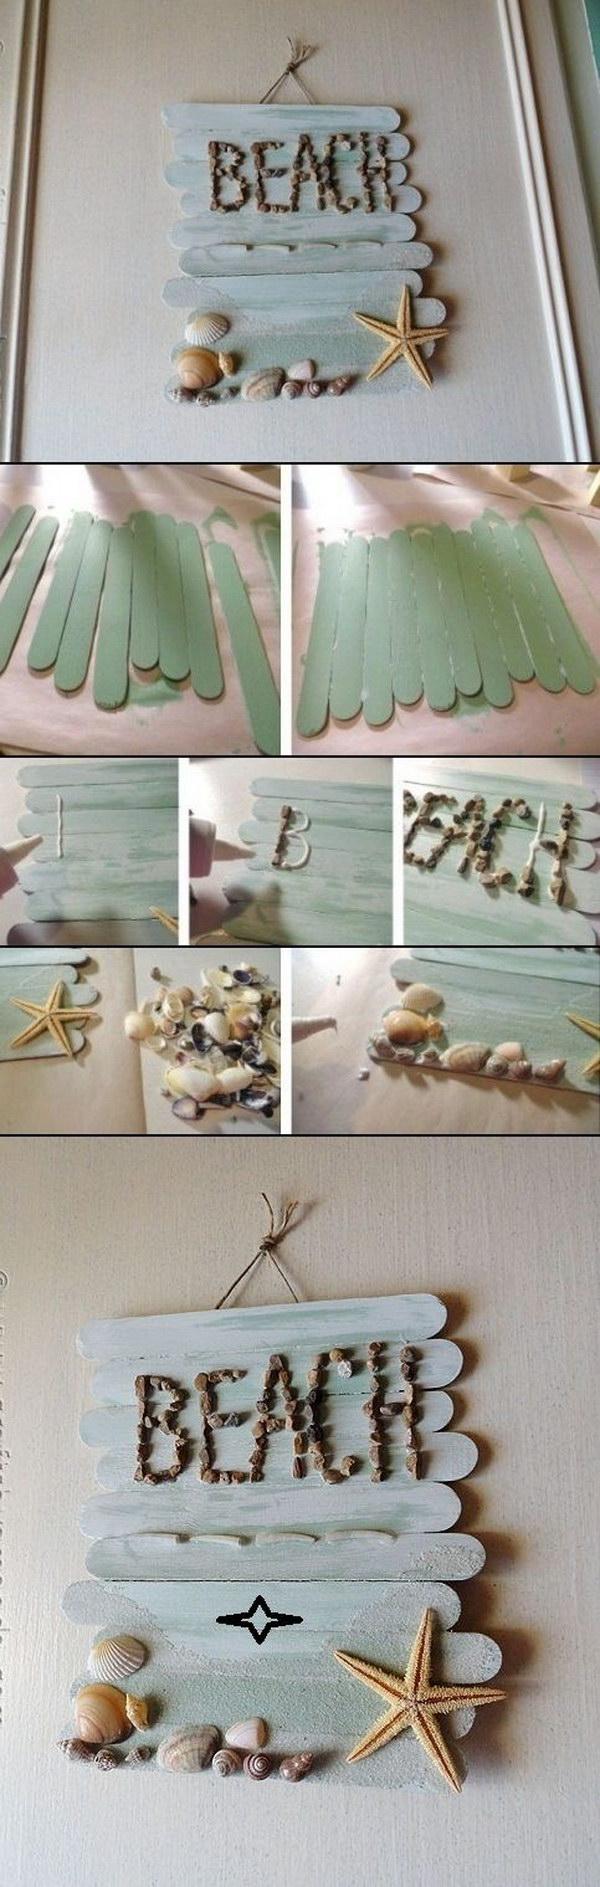 43 DIY Craft Stick Wall Art